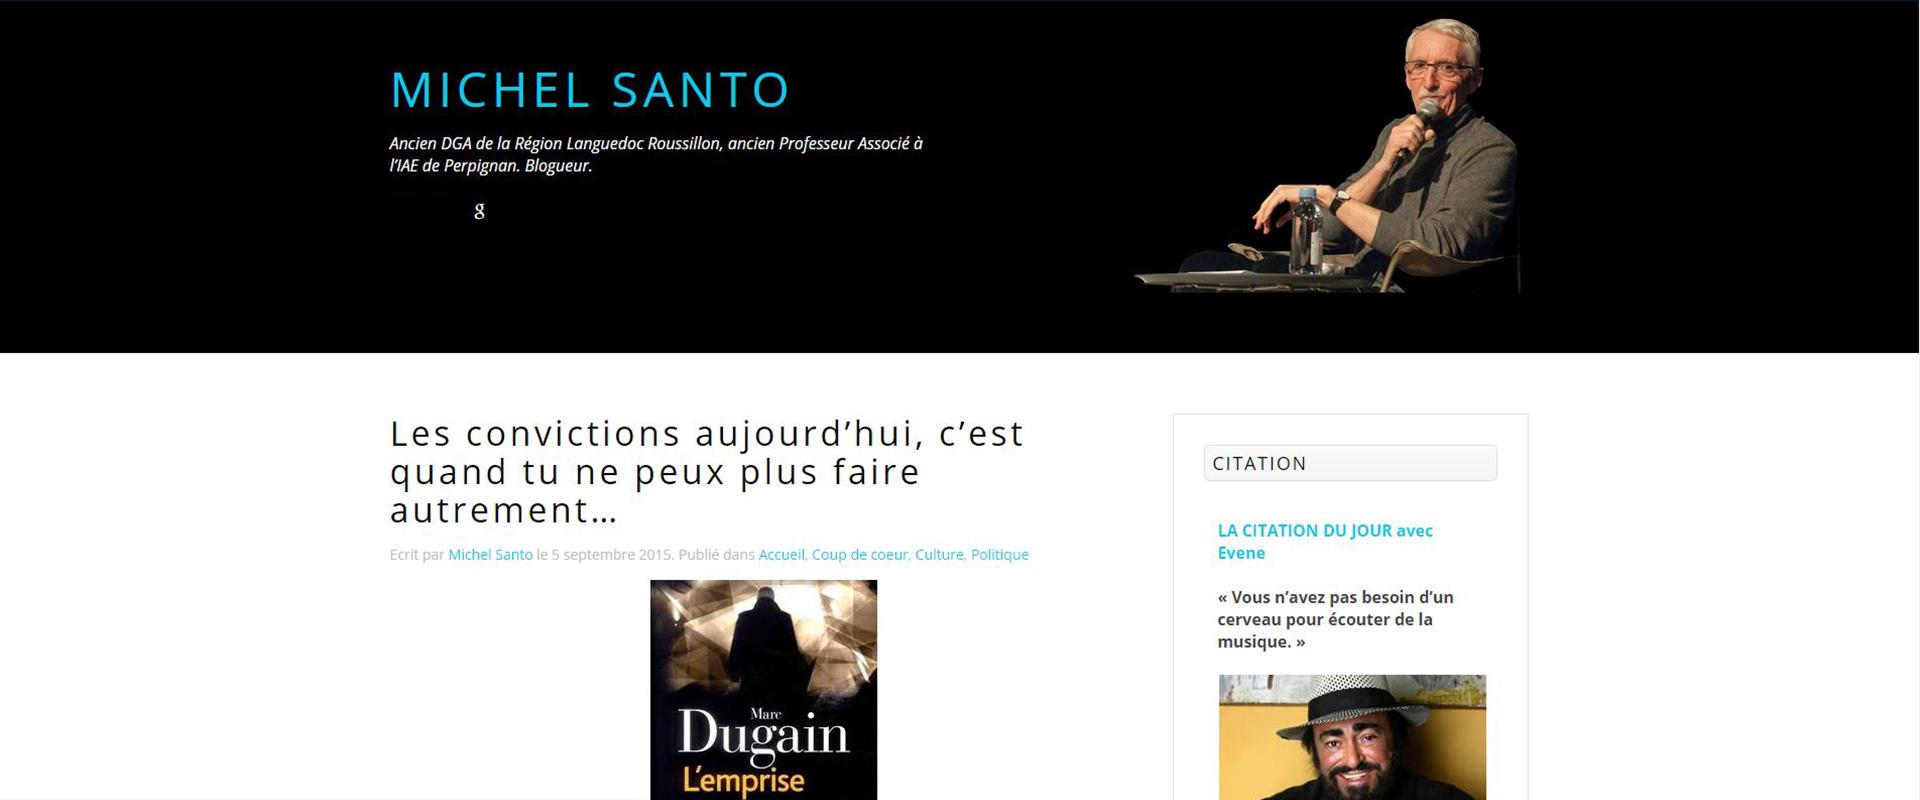 Le blog de Michel Santo